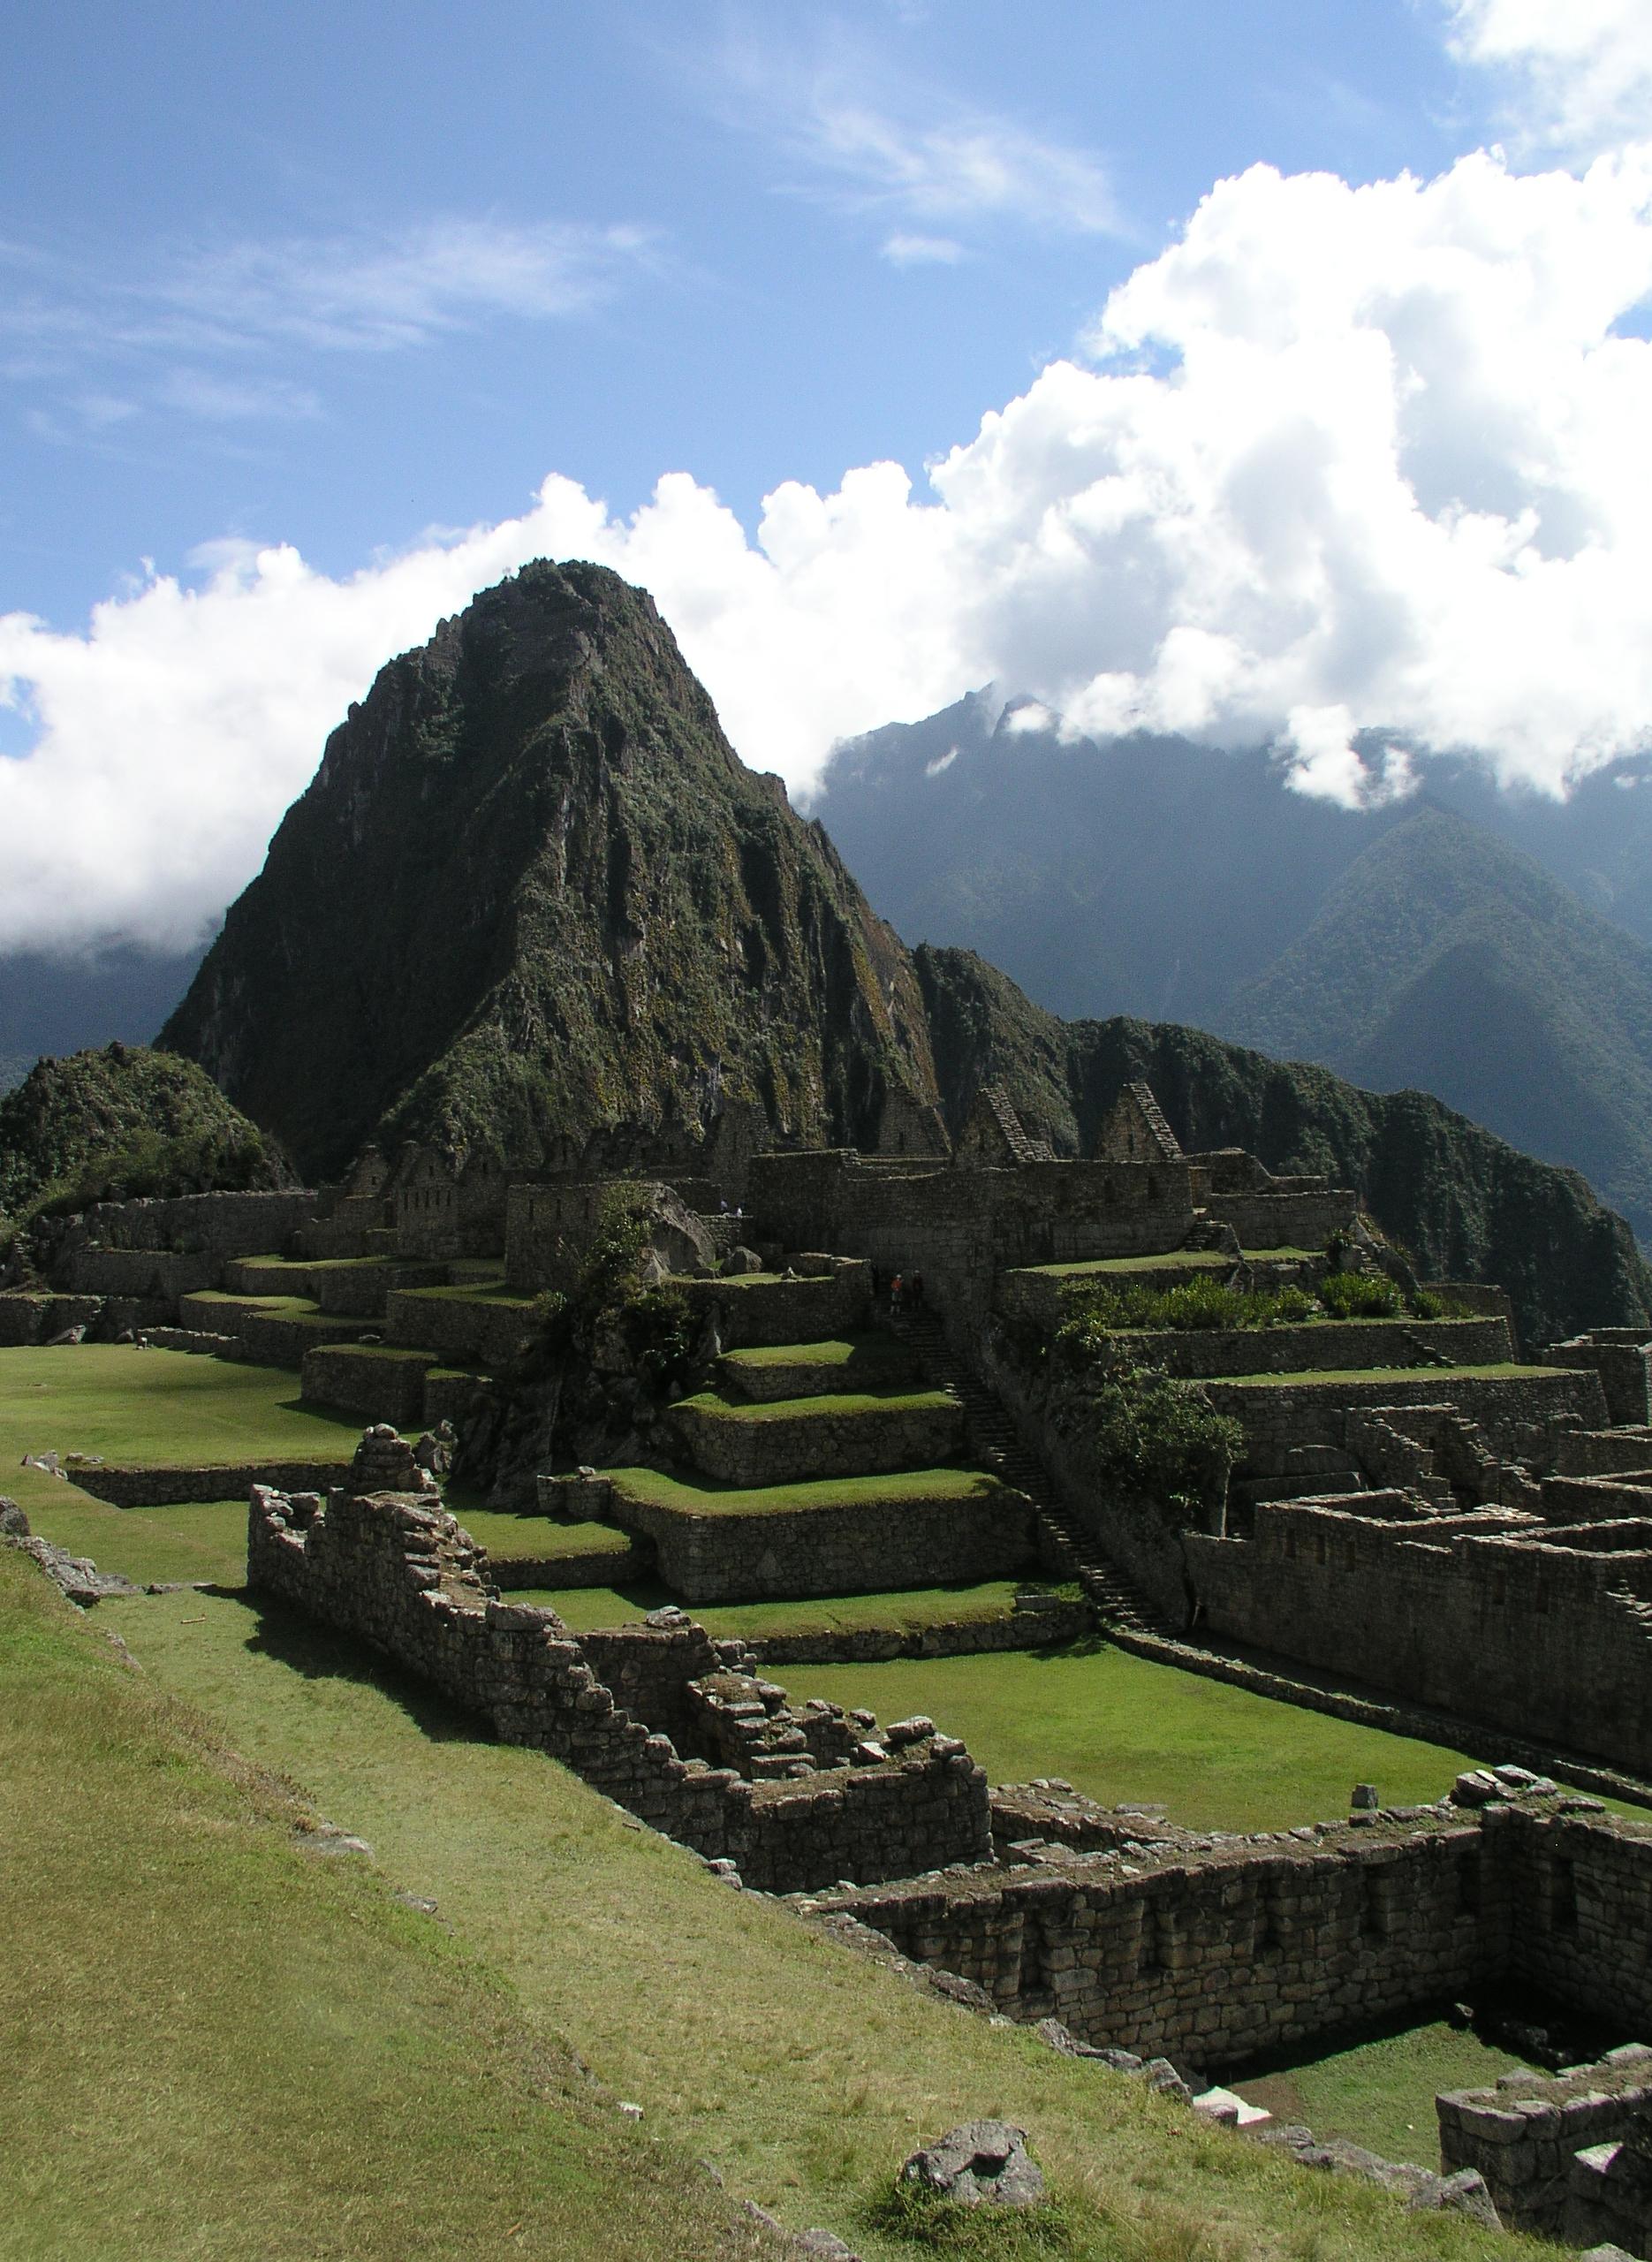 Machu Picchu by day